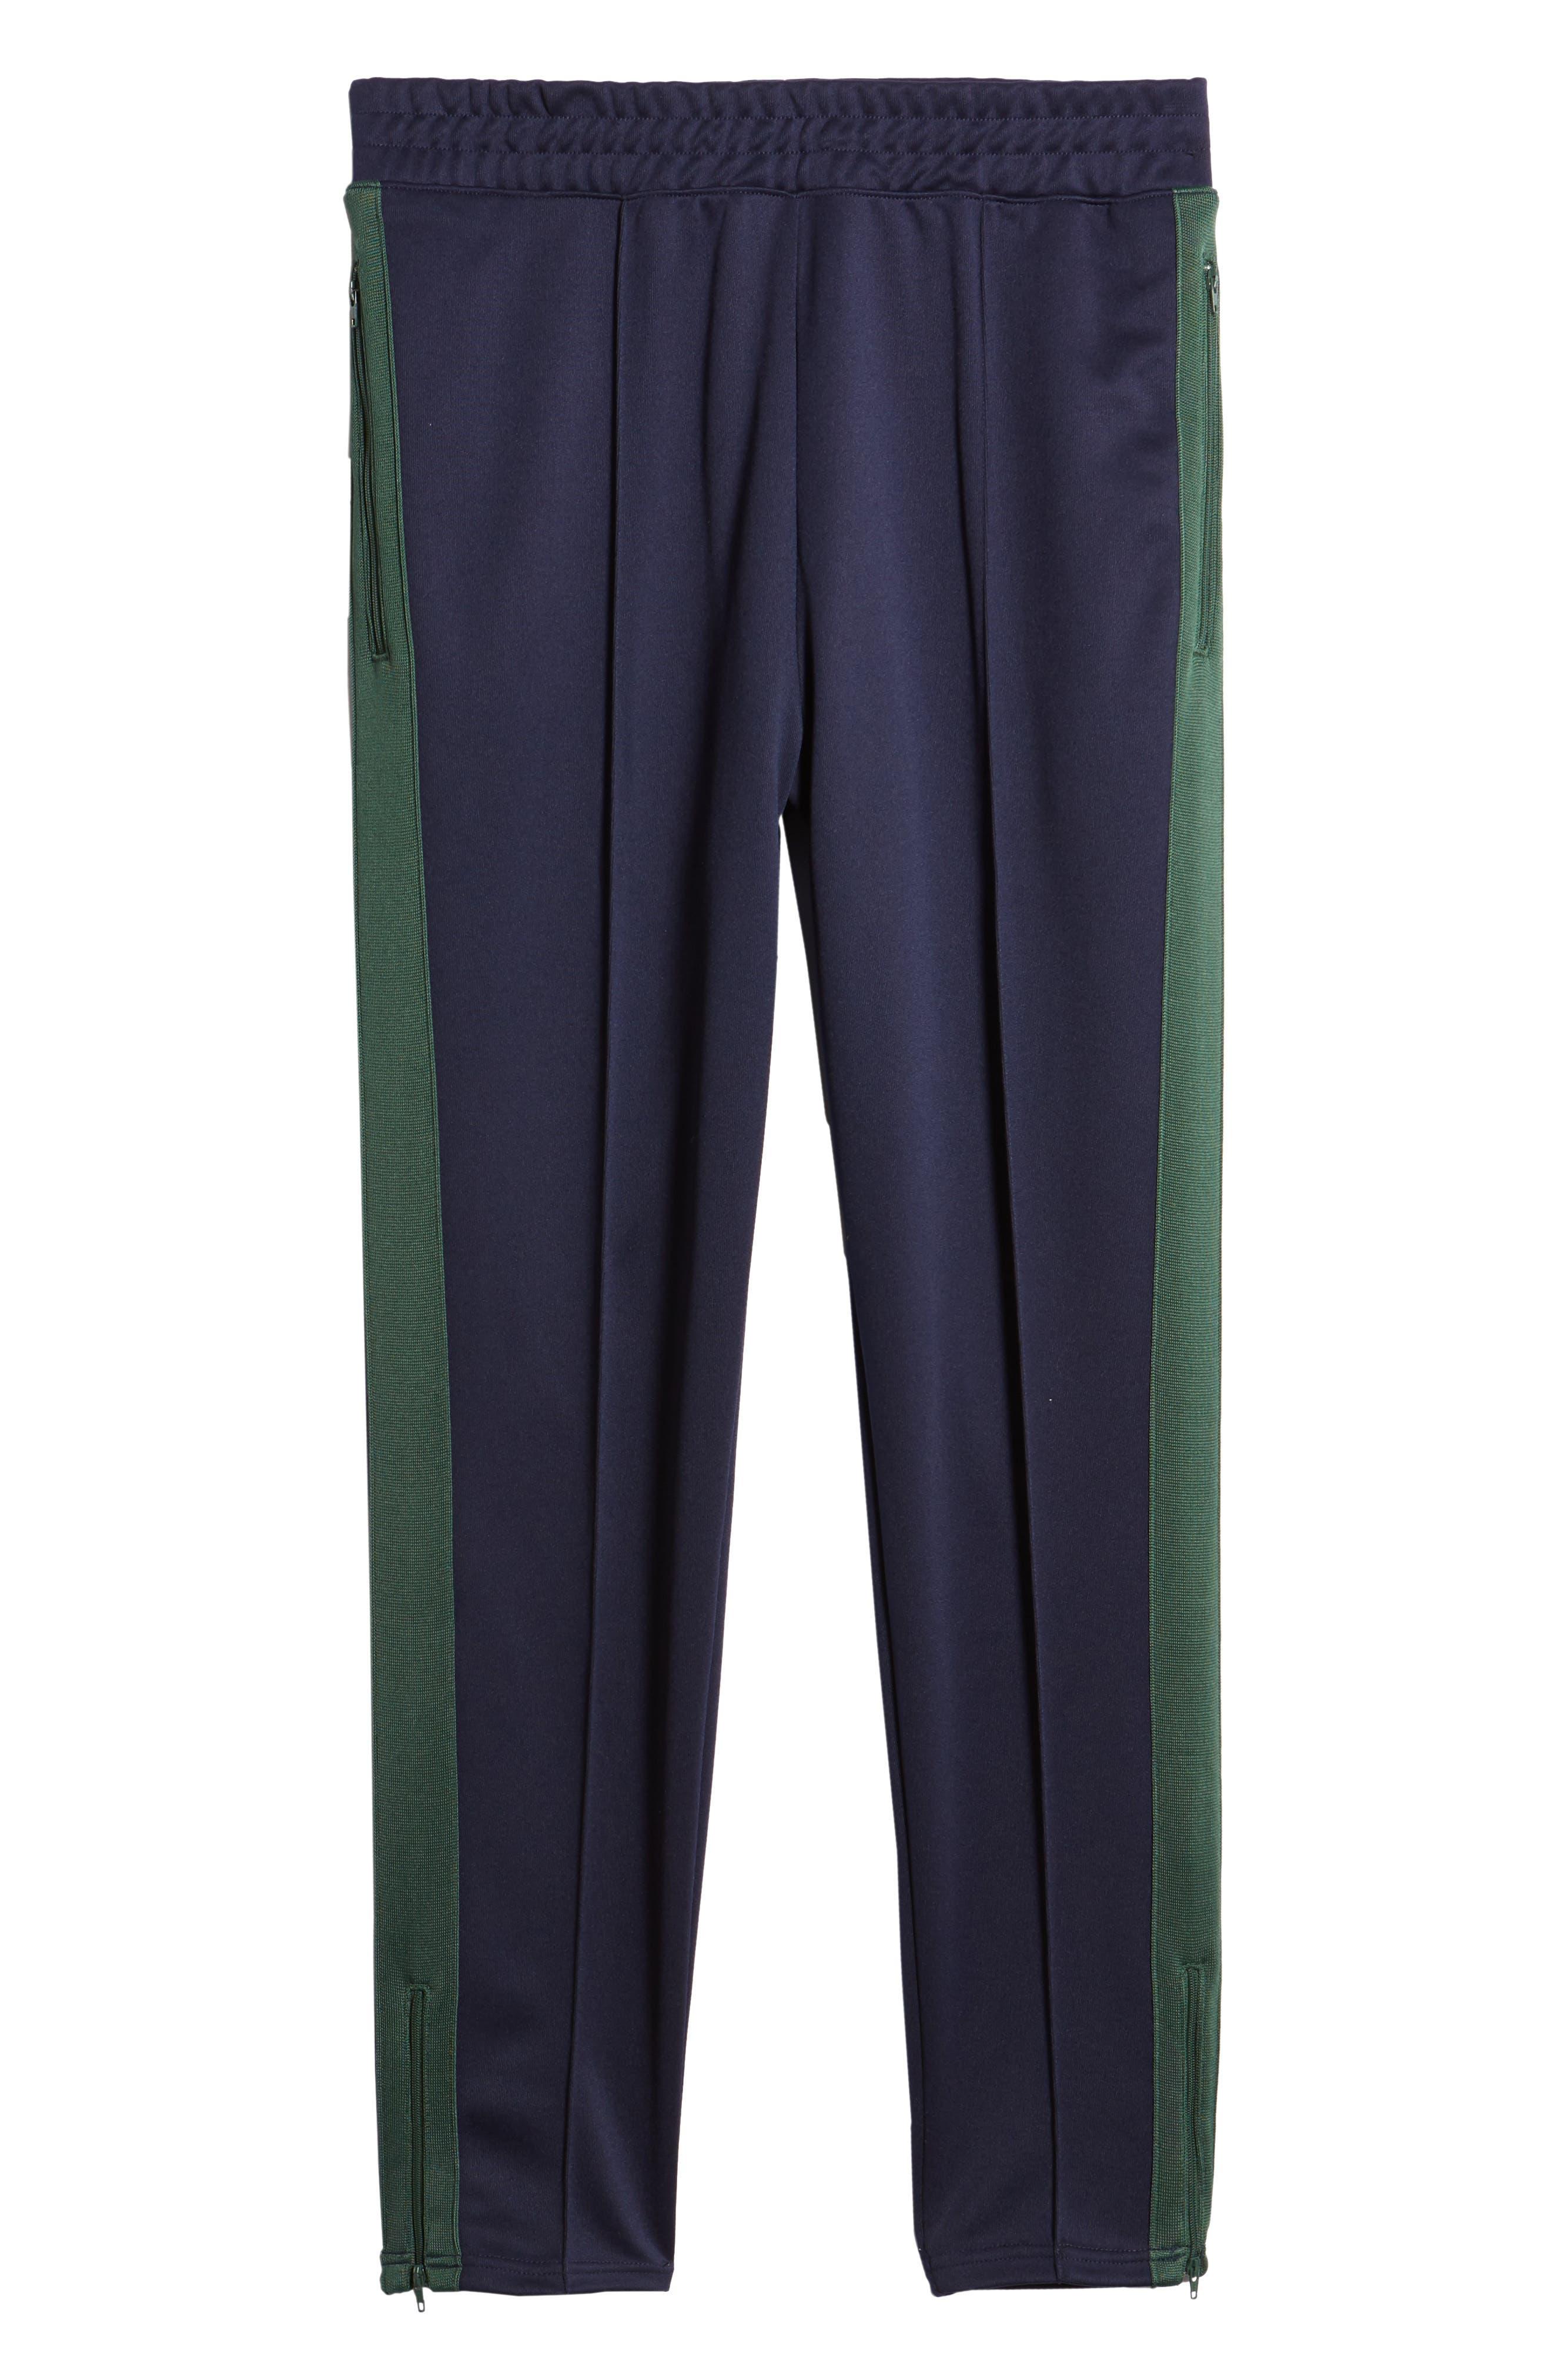 NIKE,                             x Martine Rose Men's Track Pants,                             Alternate thumbnail 6, color,                             BLACKENED BLUE/ FIR